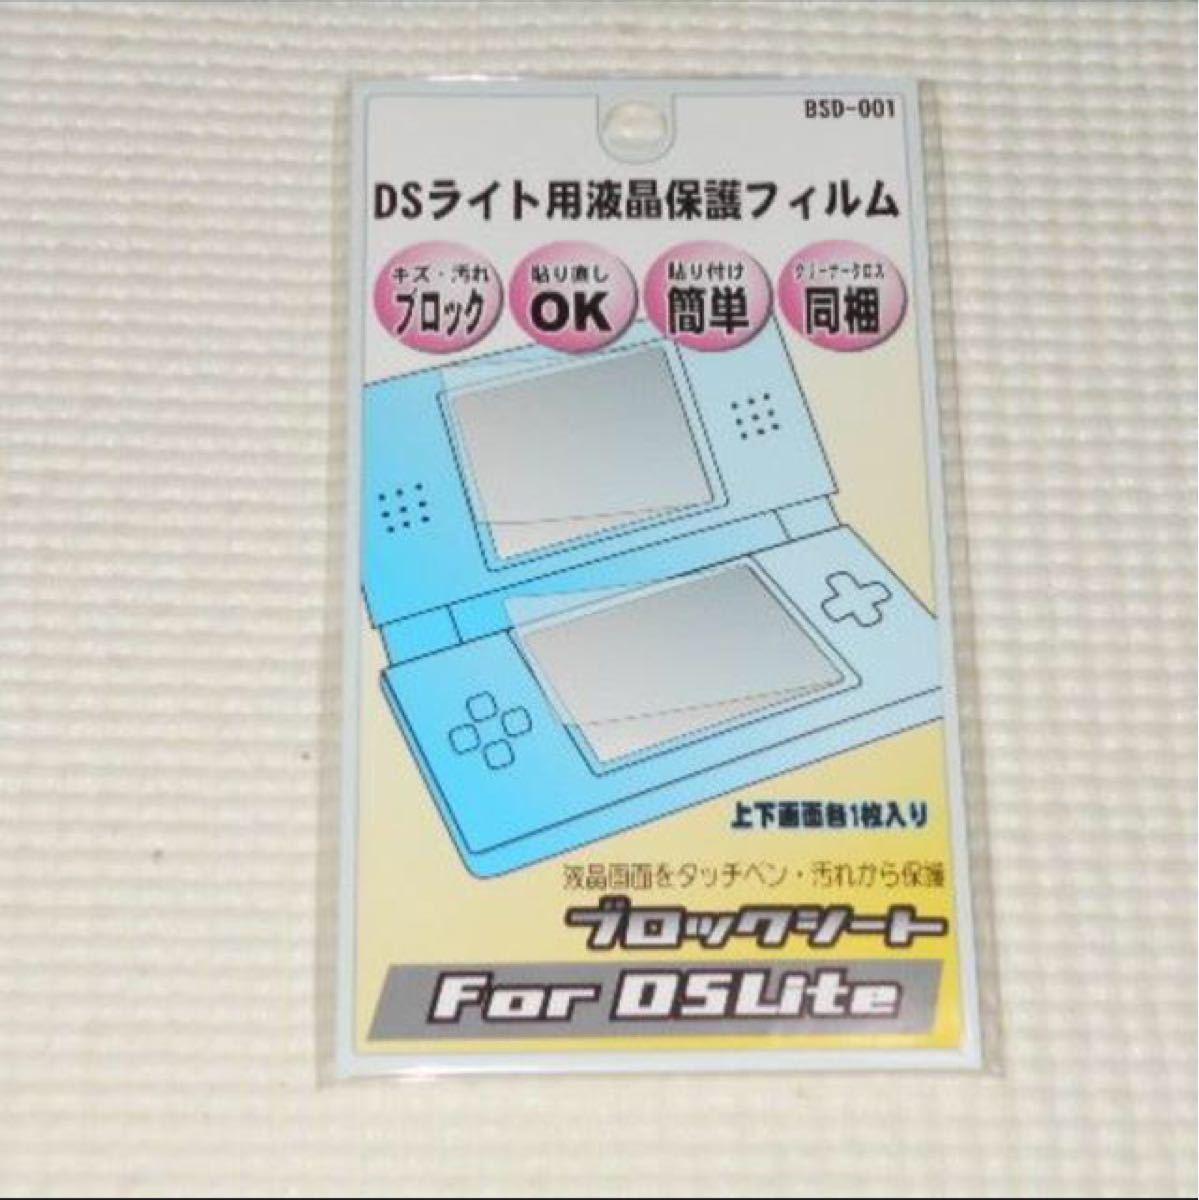 DS★DS Lite DSライト用液晶保護フィルム ブロックシート